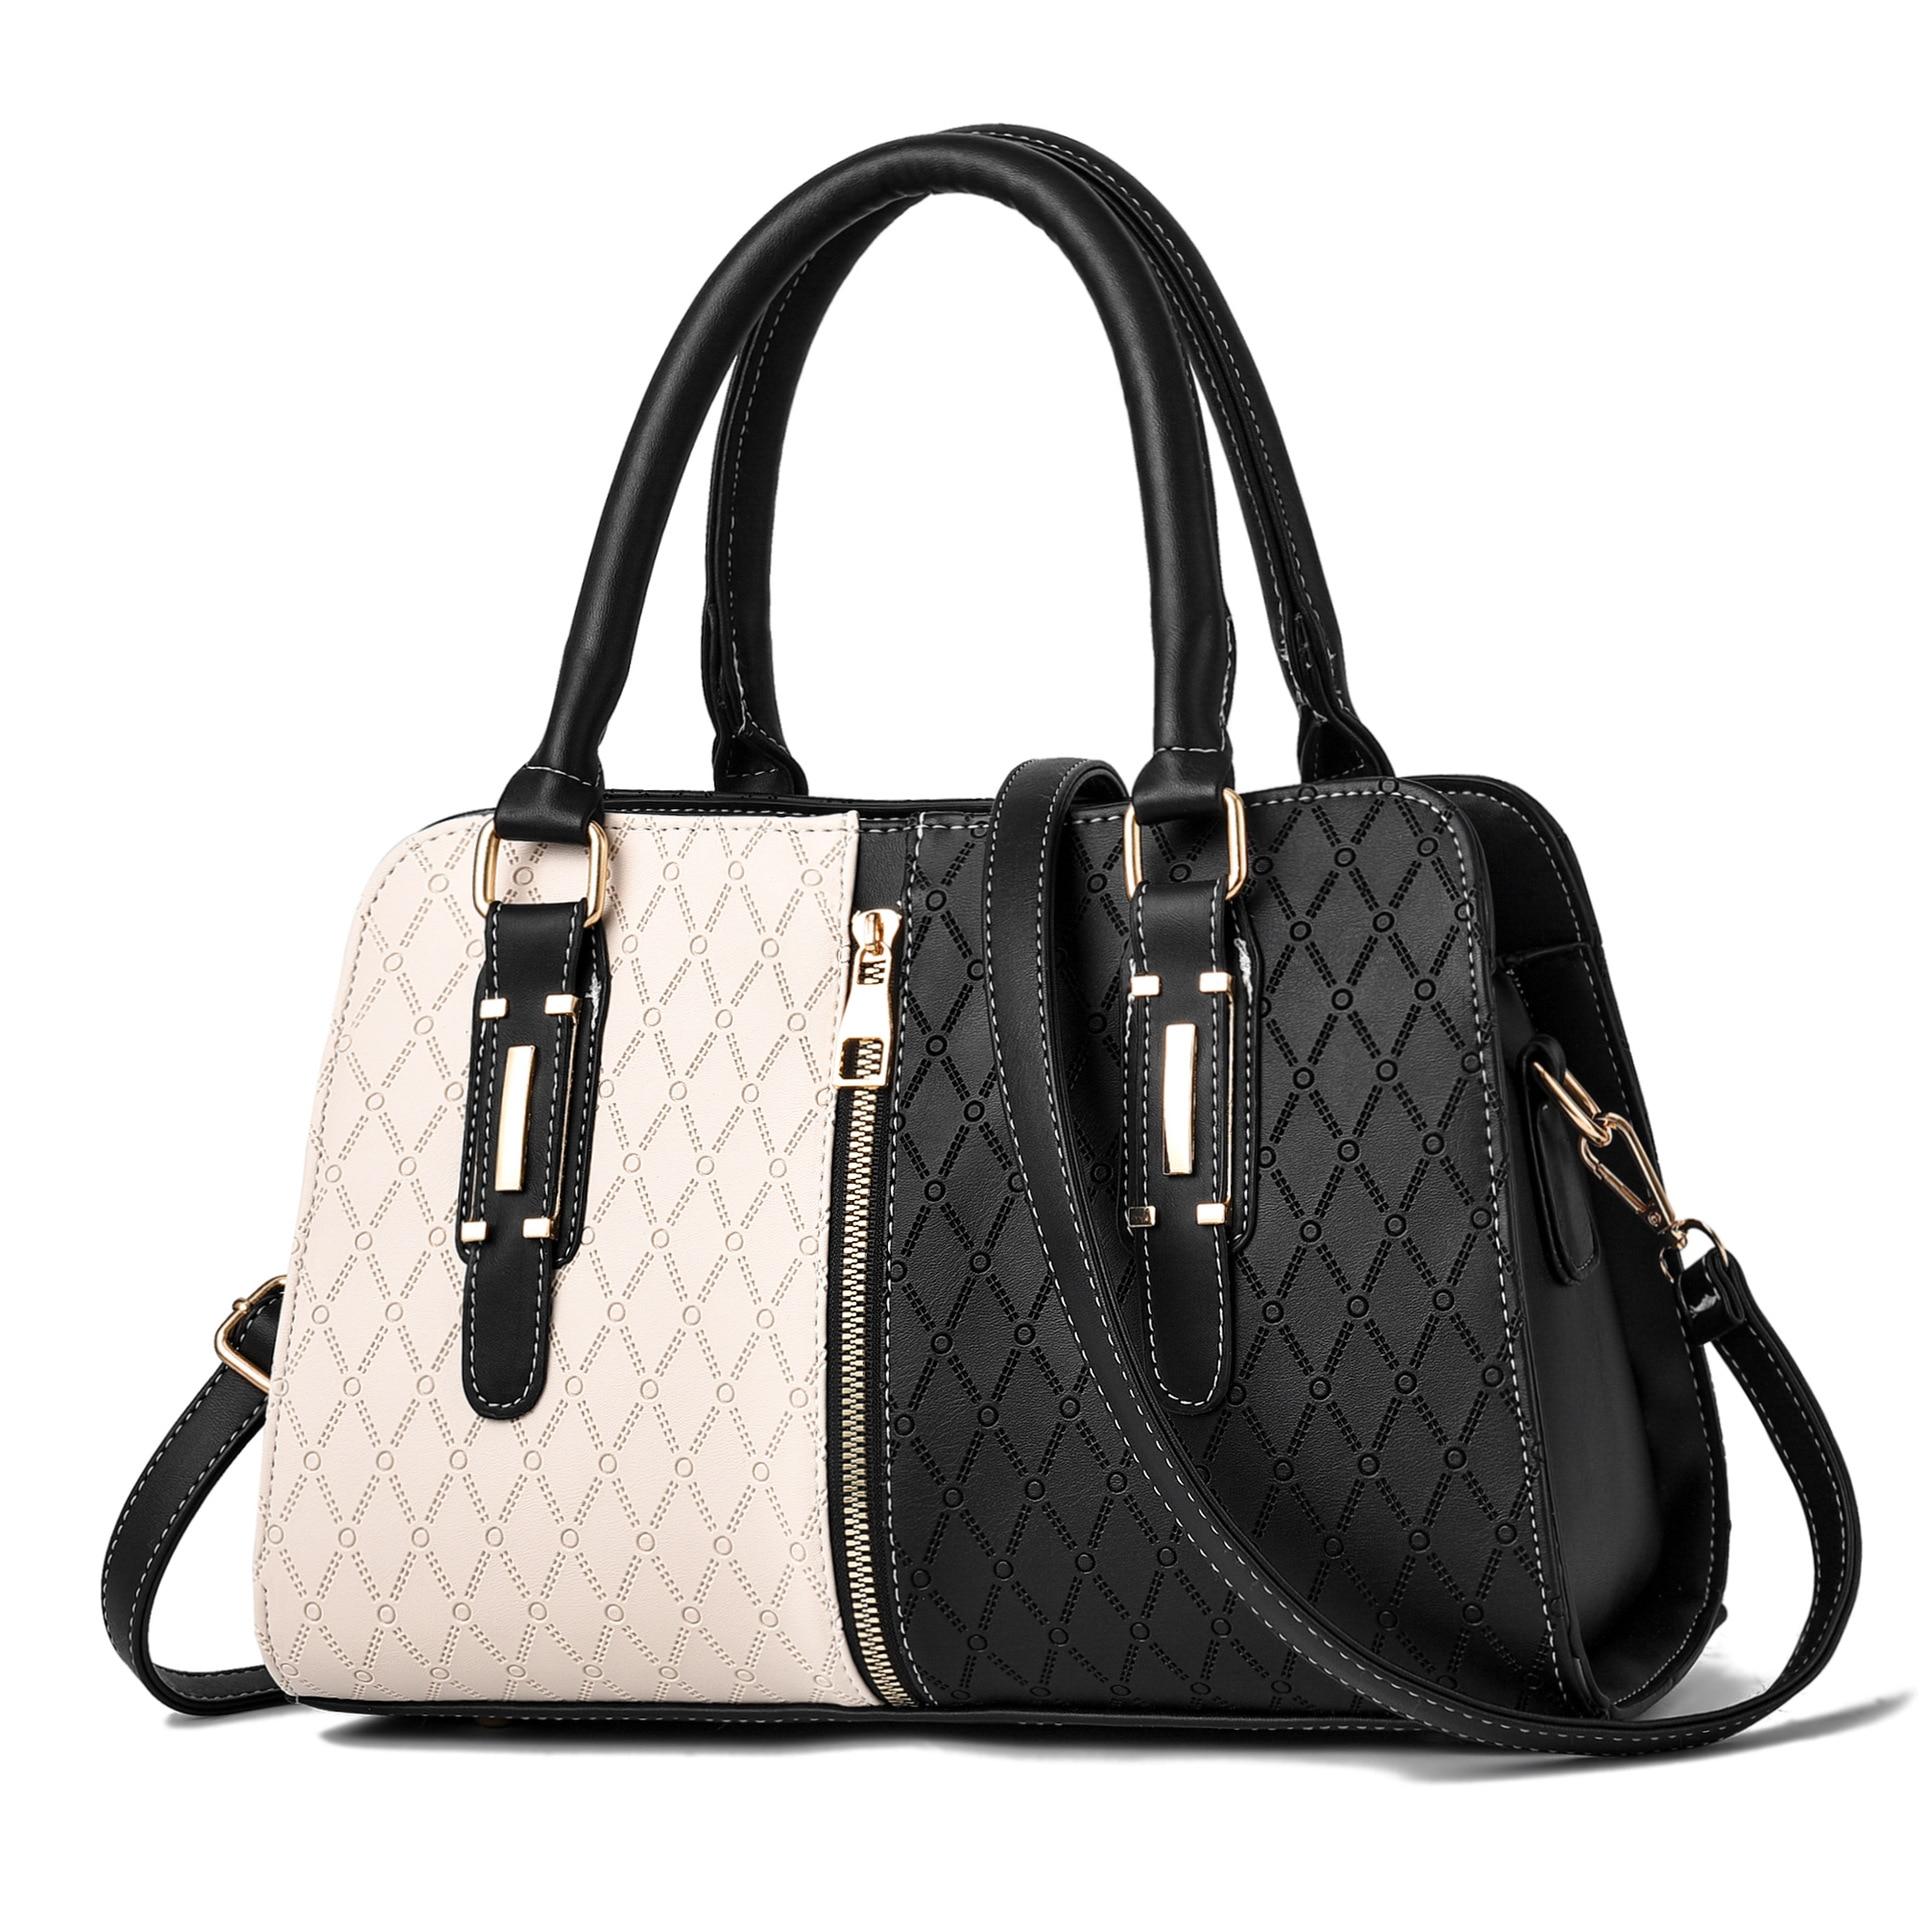 Fashion For Luxury Handbags Women PATCHWORK Bags Designer 2020 Crossbody Pu Leather Black Soft Washed Messenger Flap Bag